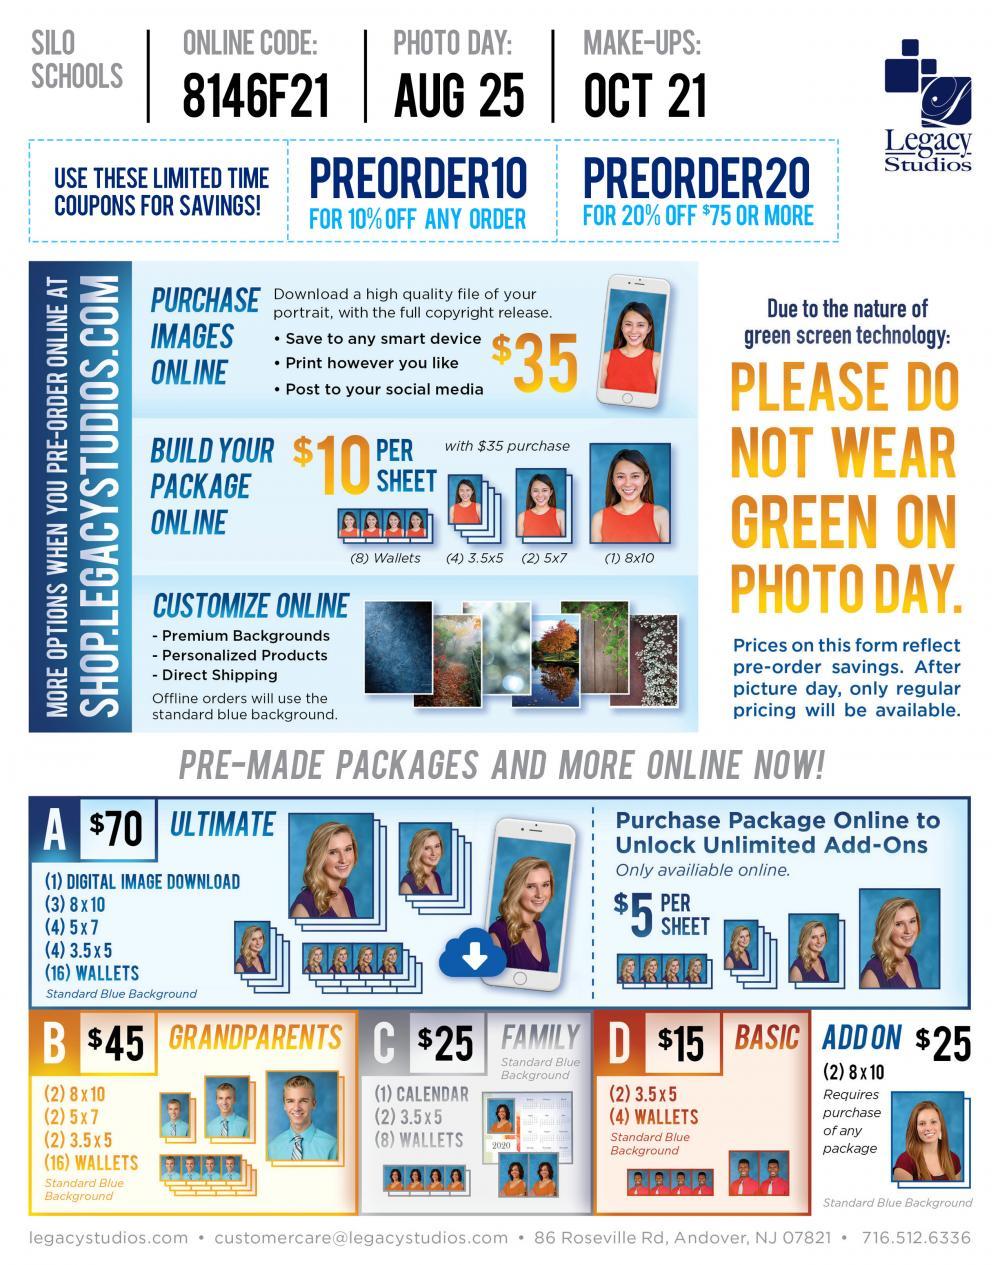 School Photo Retake Day October 21st